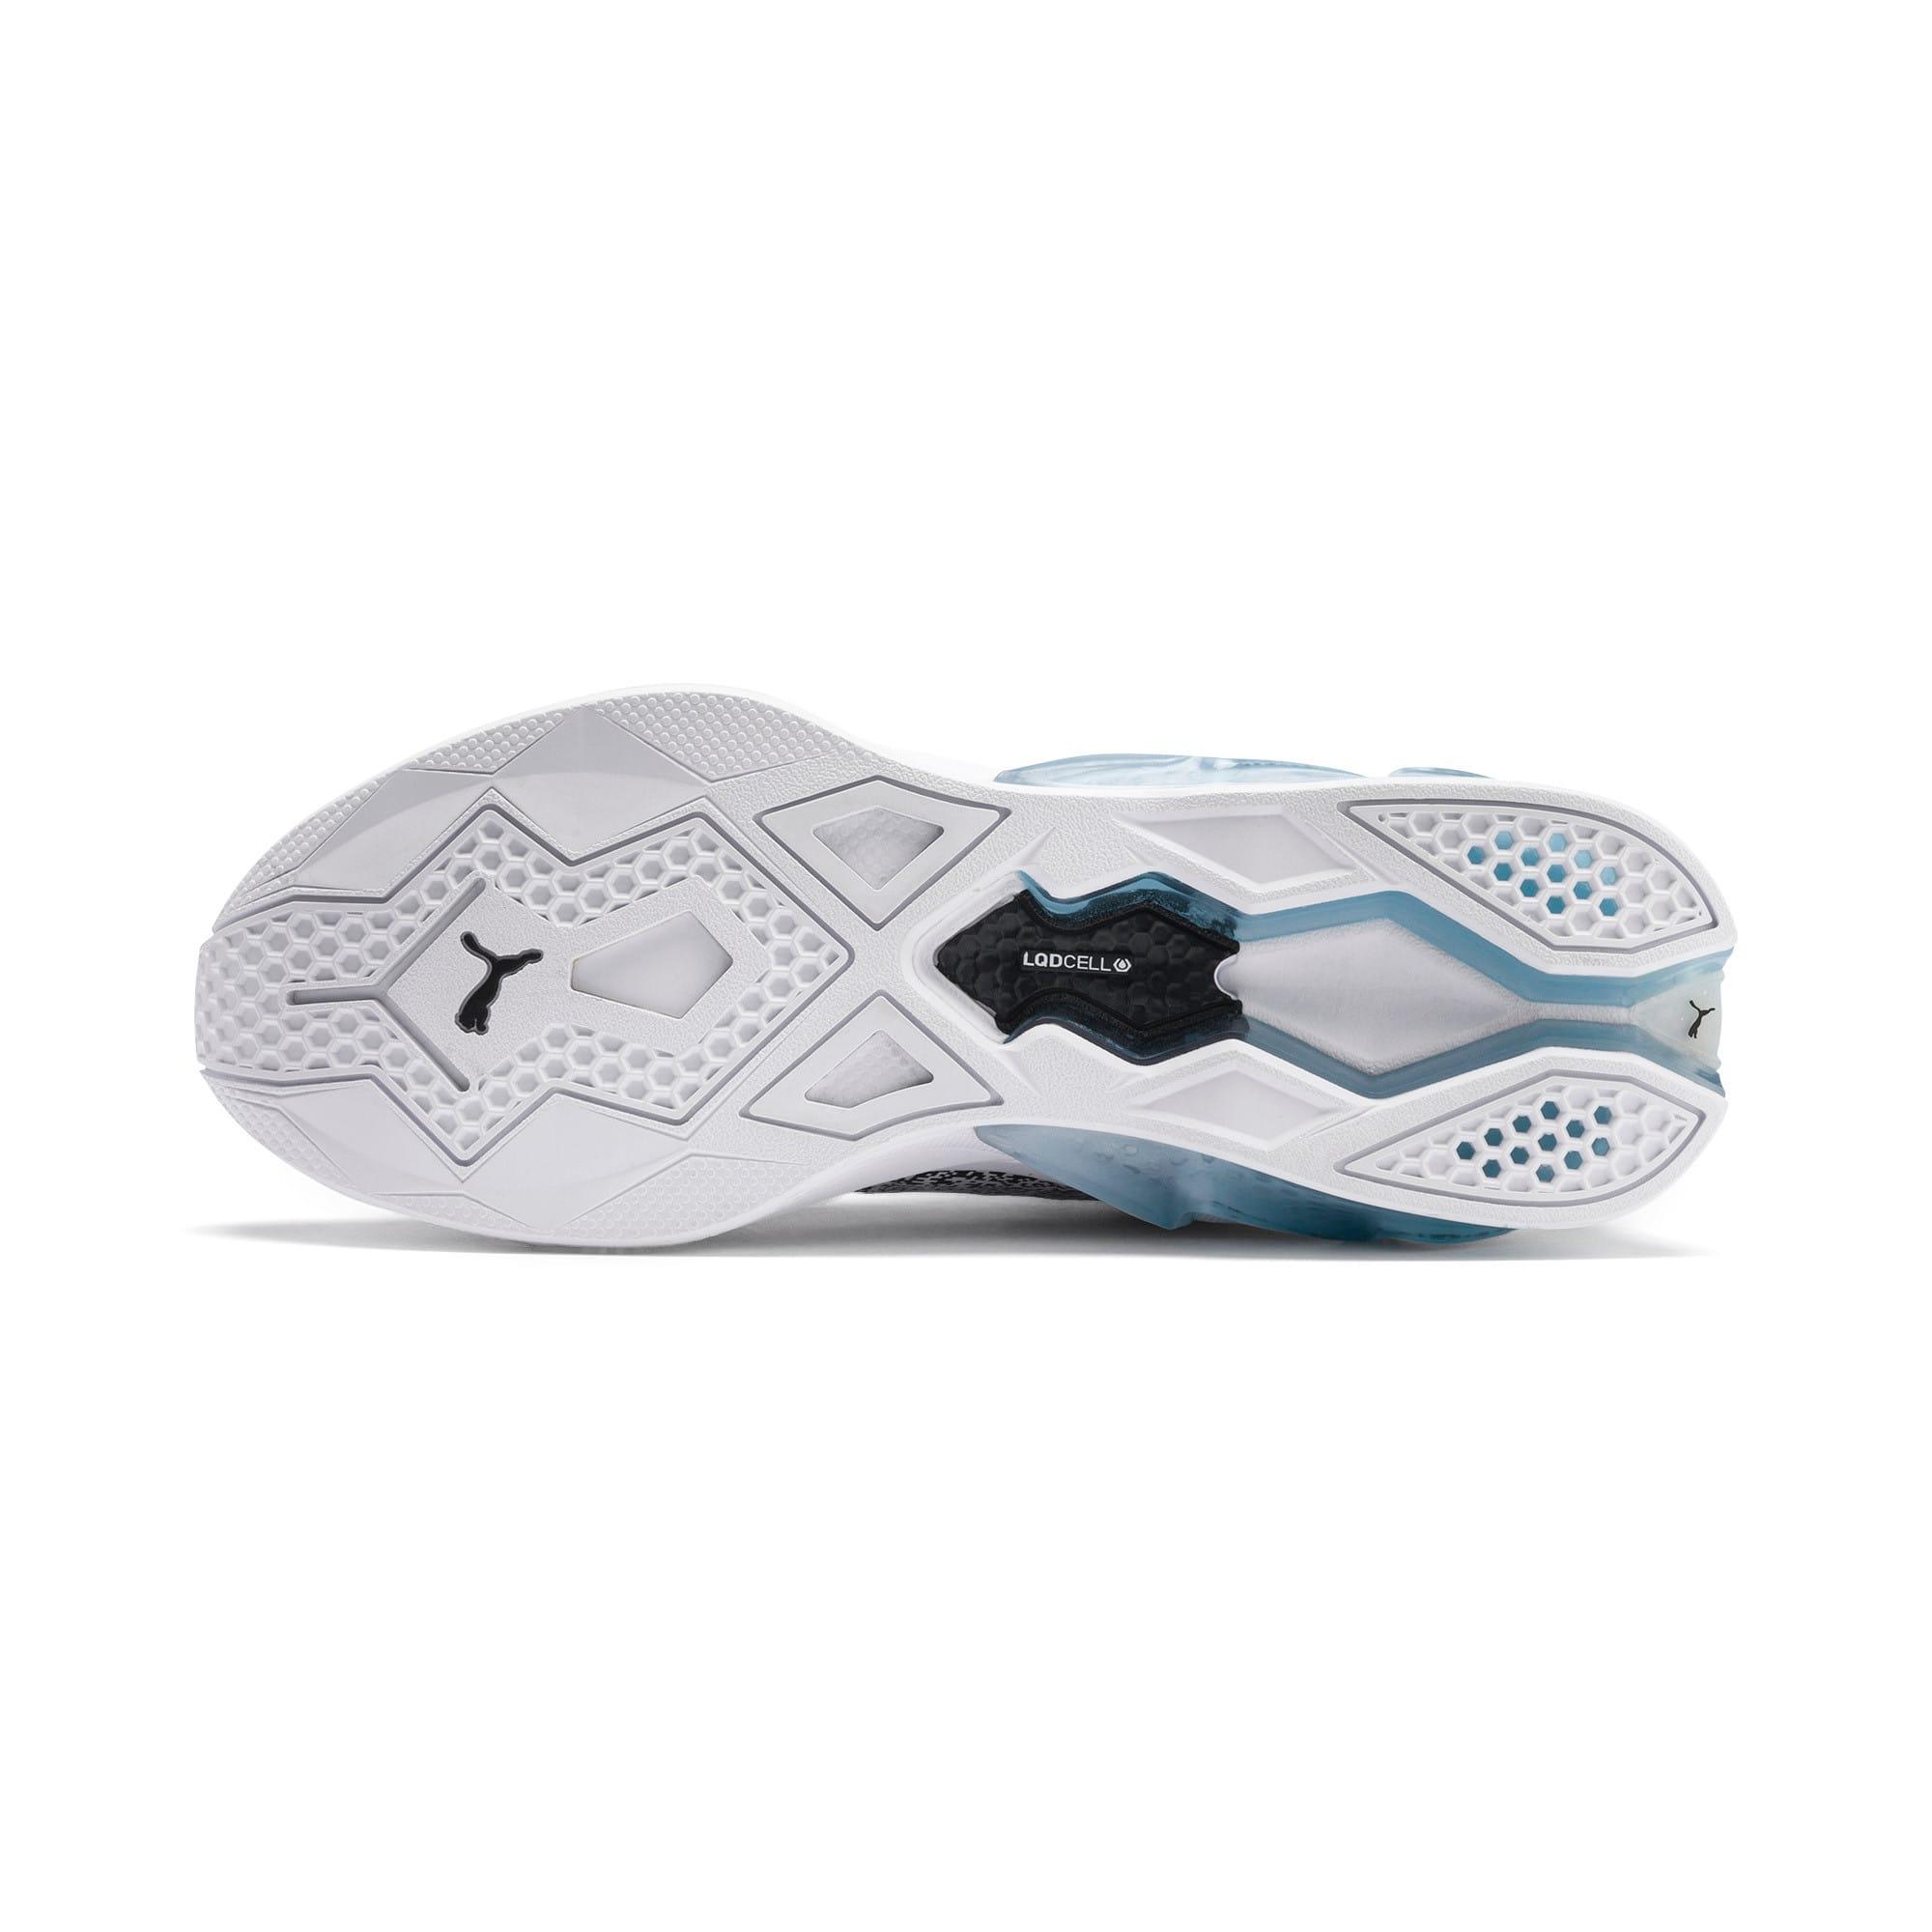 Thumbnail 4 of LQDCELL Origin AR Men's Shoes, Puma White-Puma Black, medium